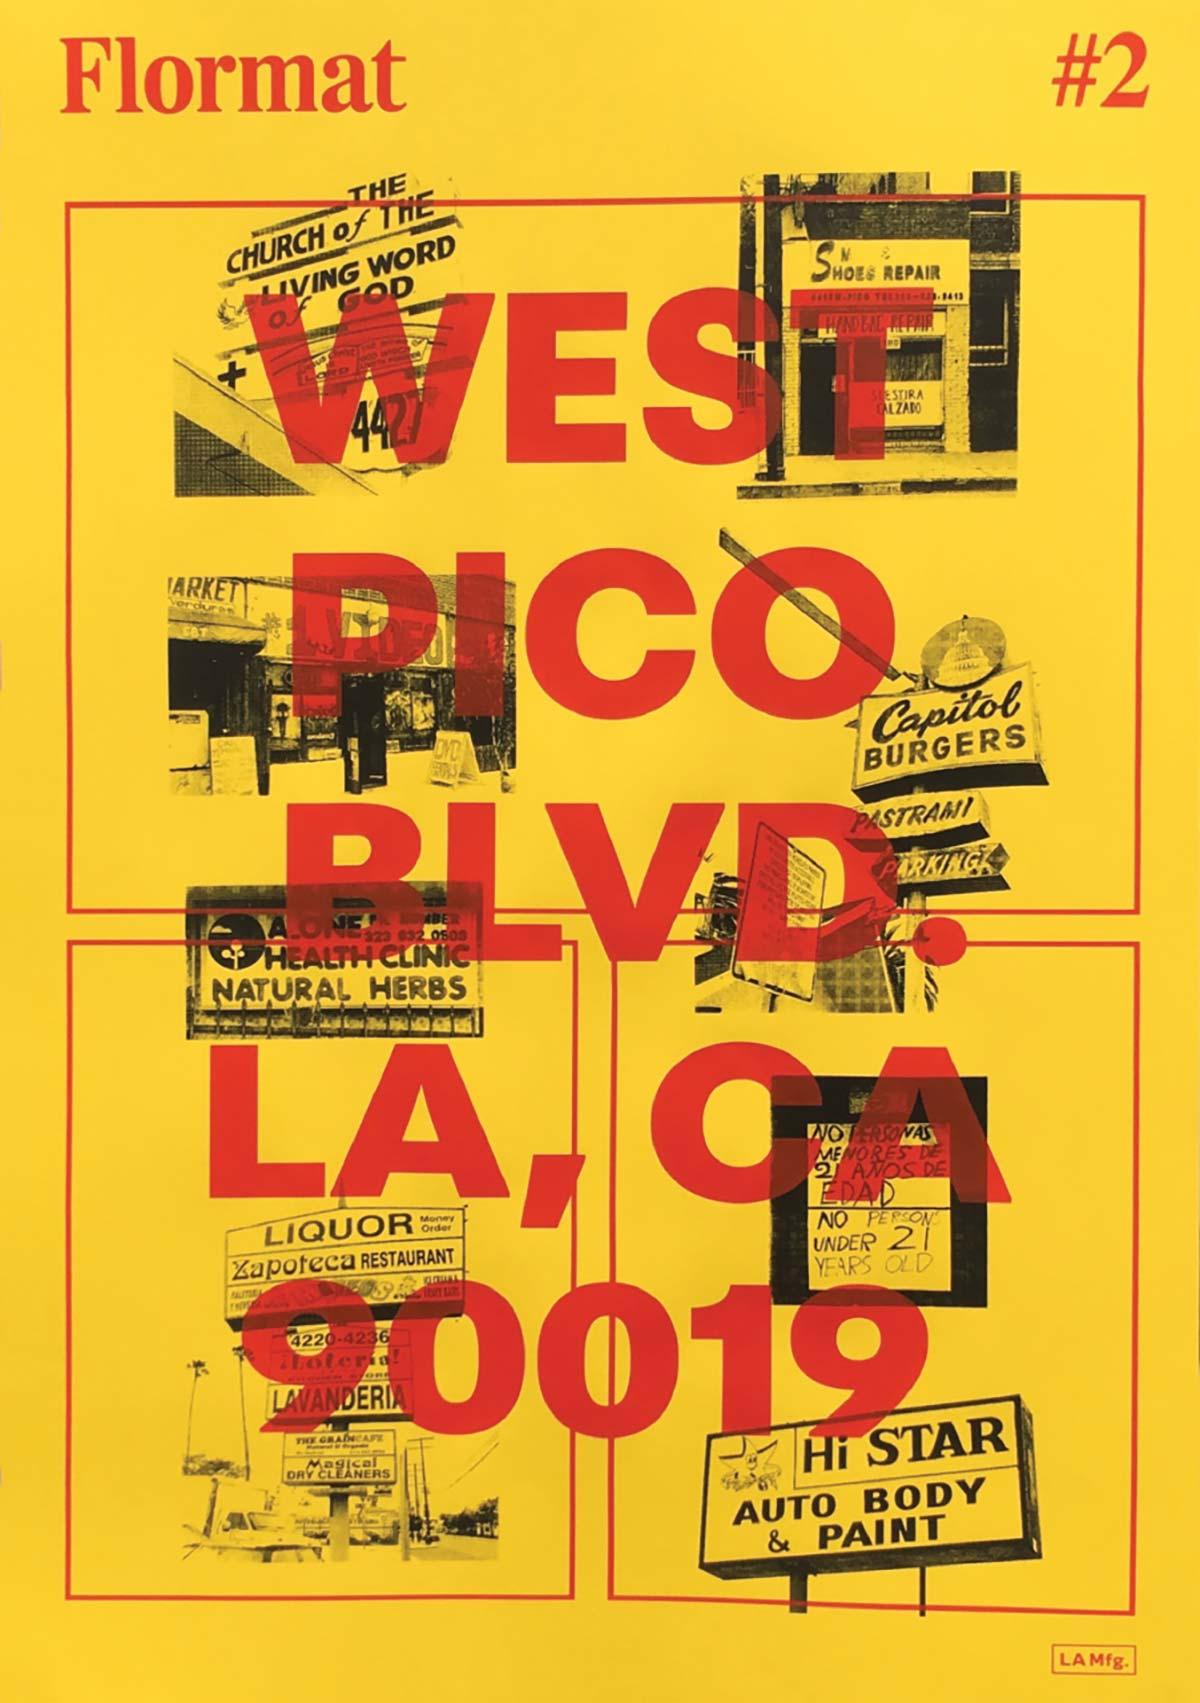 Slanted-in-LA-Luxtypo-Greg-Lindy_09